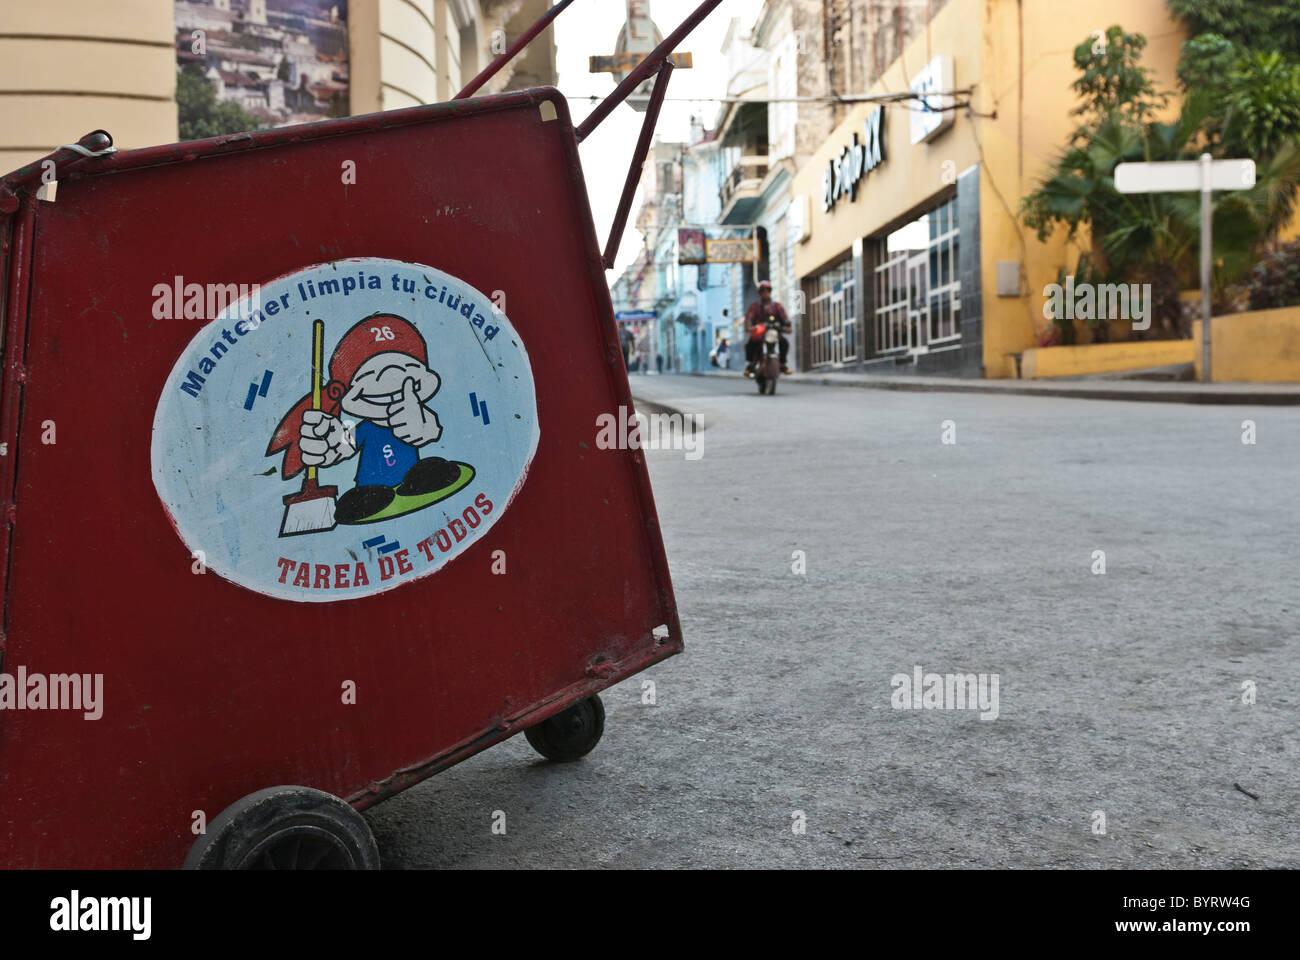 Street dustbin with political signs. Santiago de Cuba, Cuba, Caribbean. - Stock Image